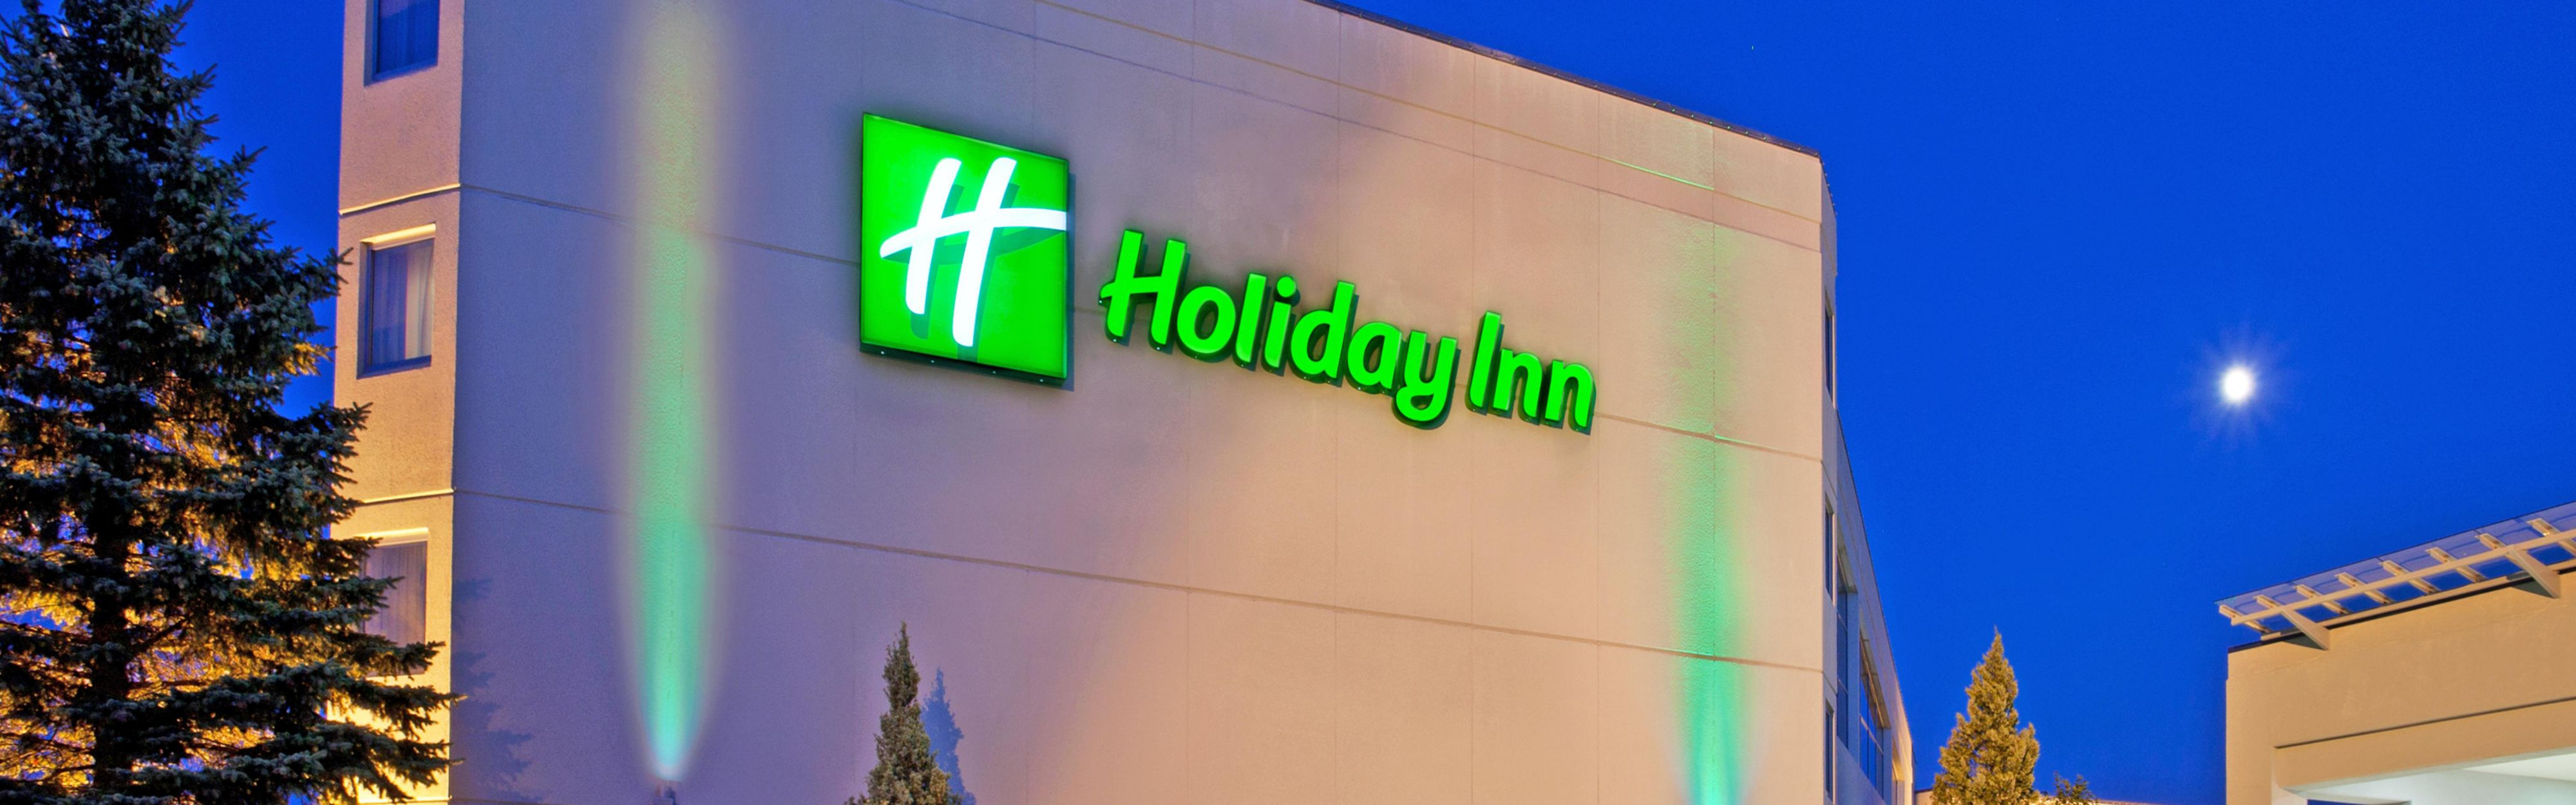 Holiday Inn Flint - Grand Blanc Area image 0